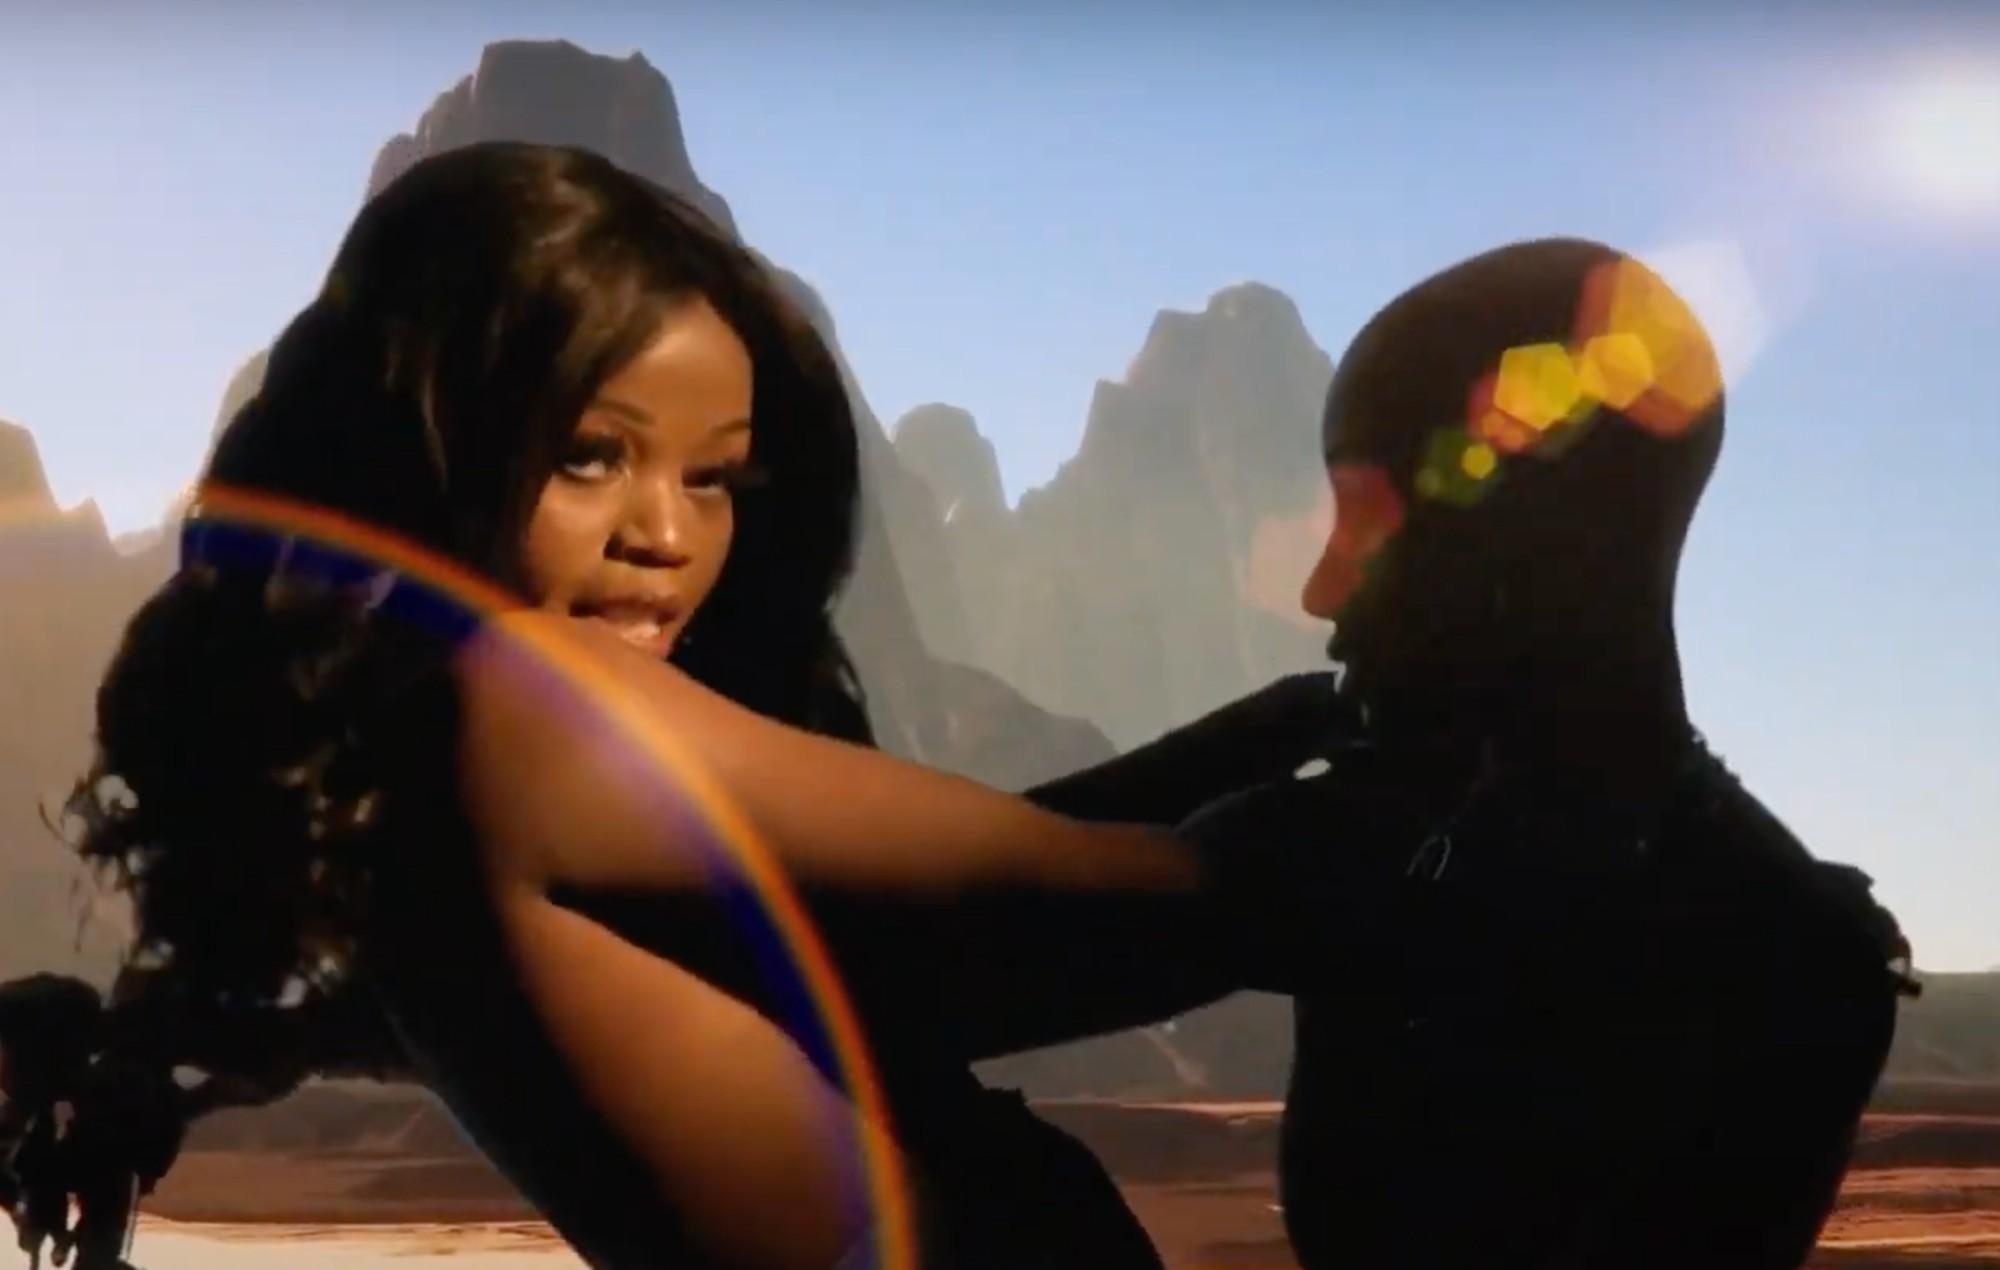 Tkay Maidza cosplays as Kim Possible and Kim Kardashian in 'Kim' video featuring Yung Baby Tate